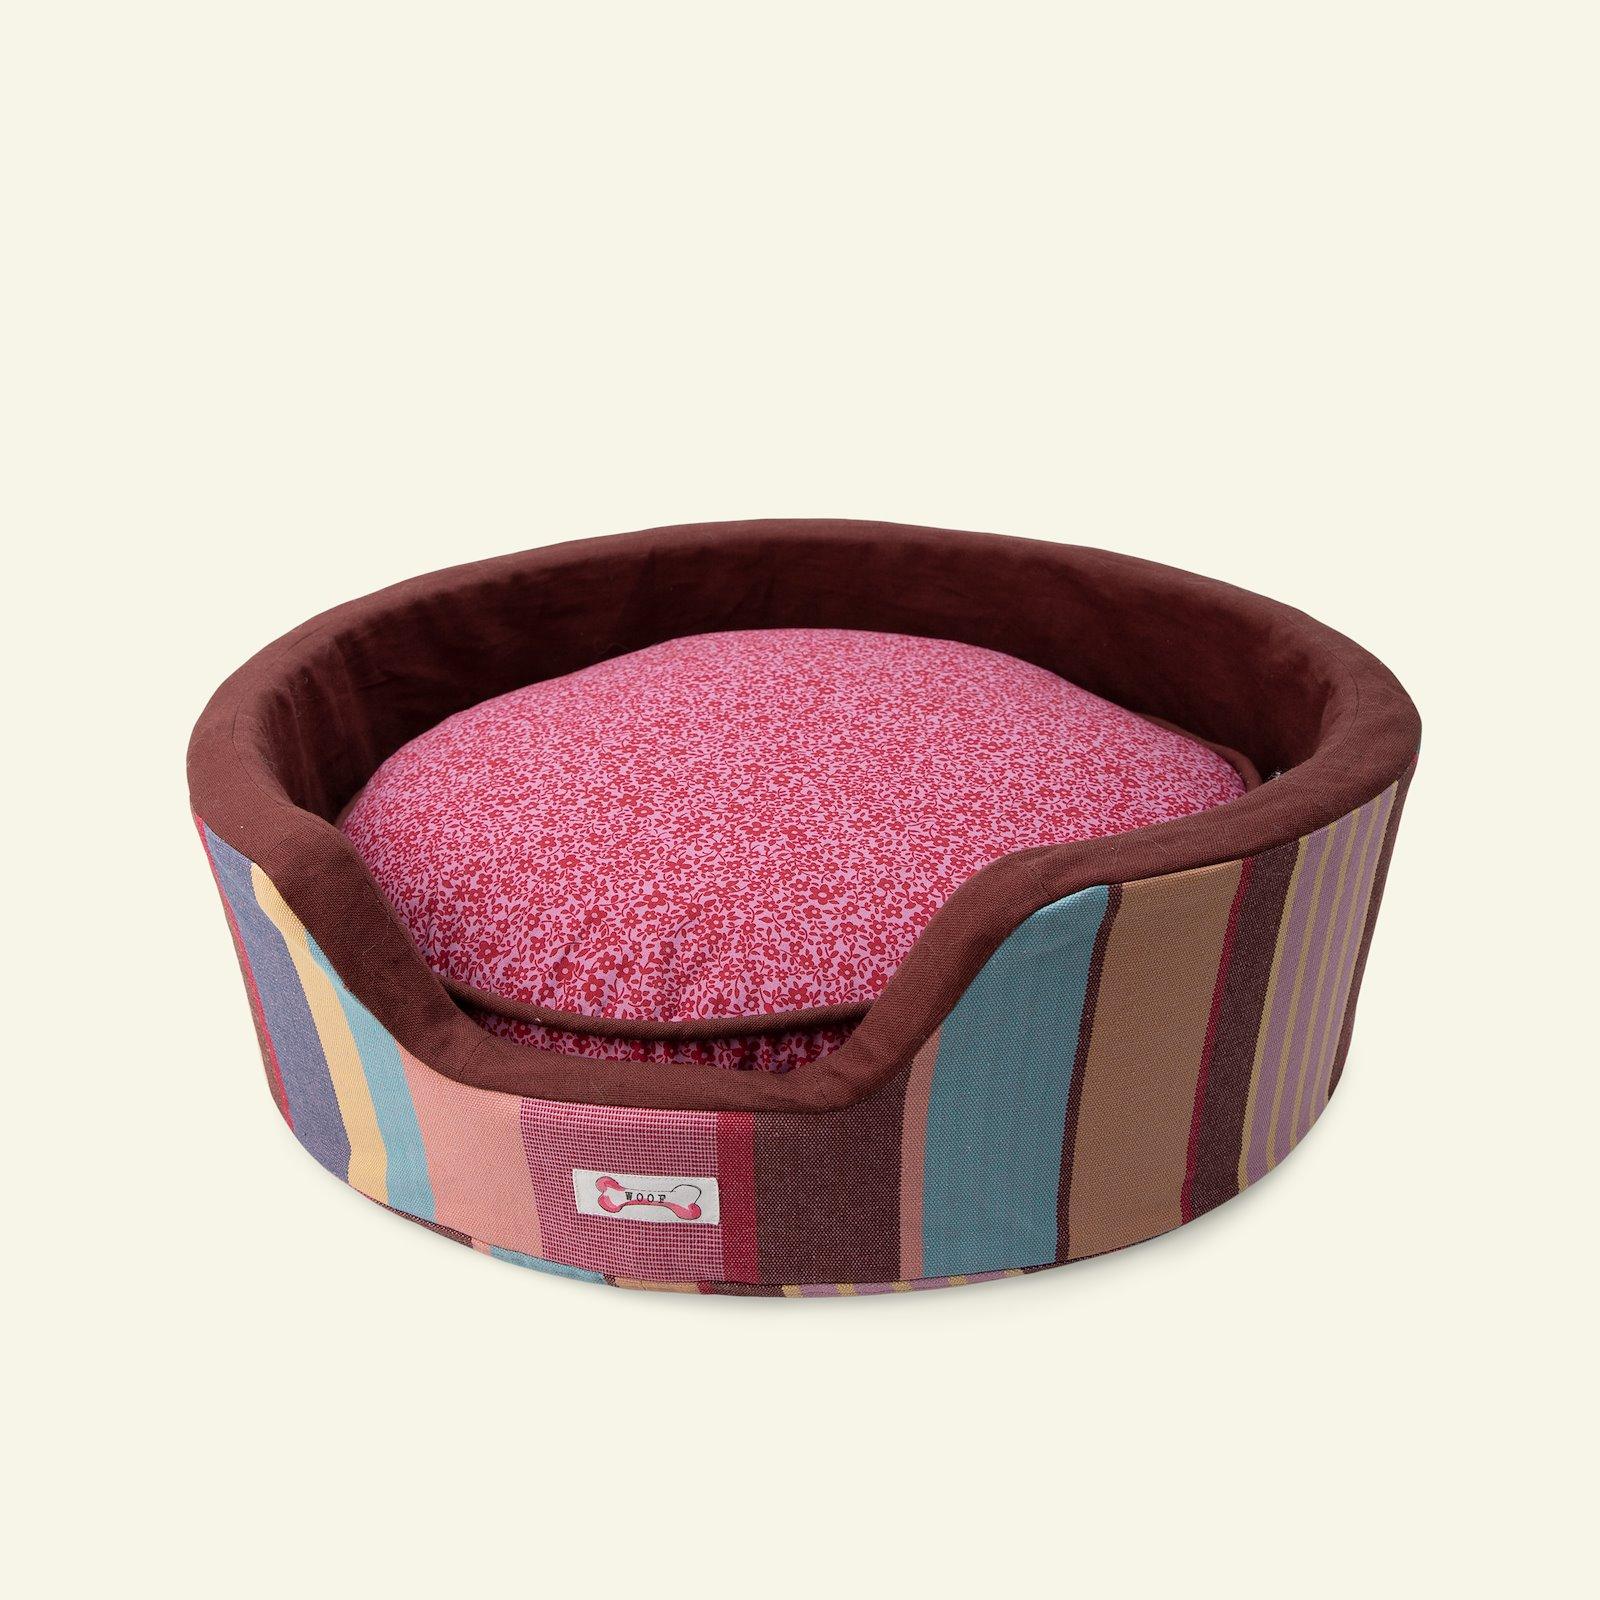 Patch kit dog nature/pink 3 pcs p90348_780550_410144_852413_24848_p90346_852414_780540_910_22309_22313_30333_45203_bundle